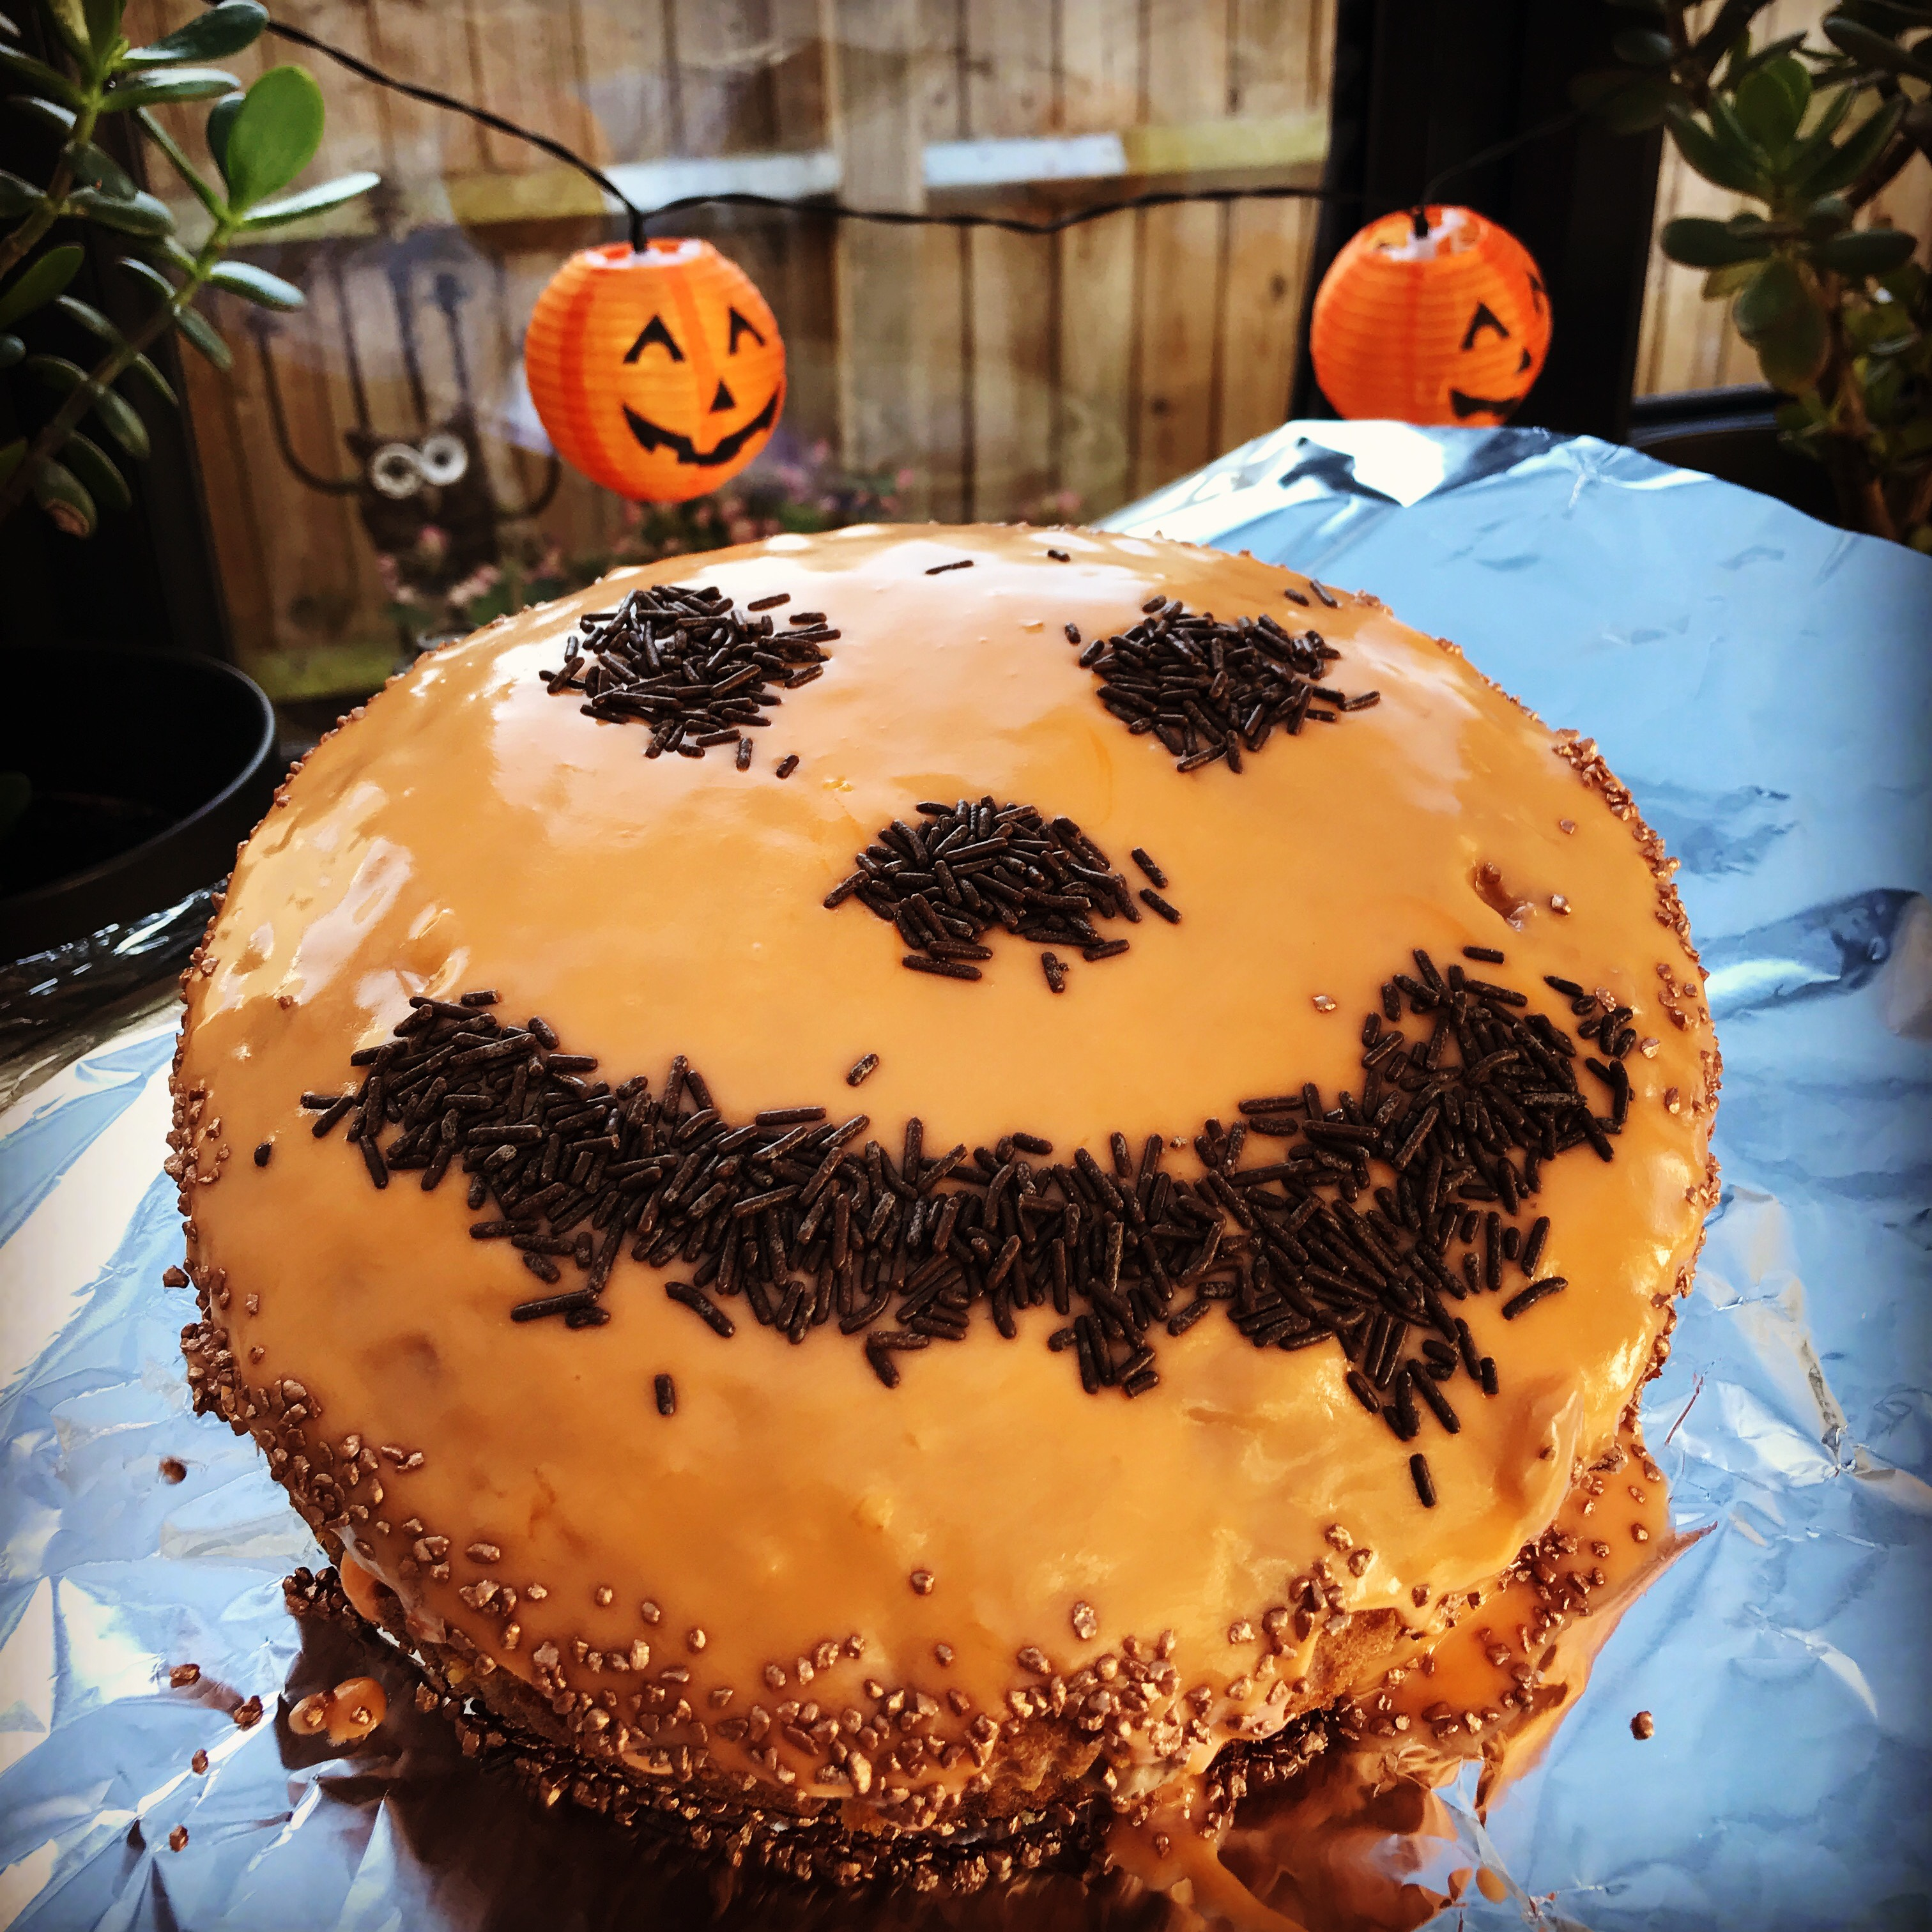 Tremendous Chocolate Orange Birthday Cake Recipe Perfect For Halloween Funny Birthday Cards Online Inifofree Goldxyz